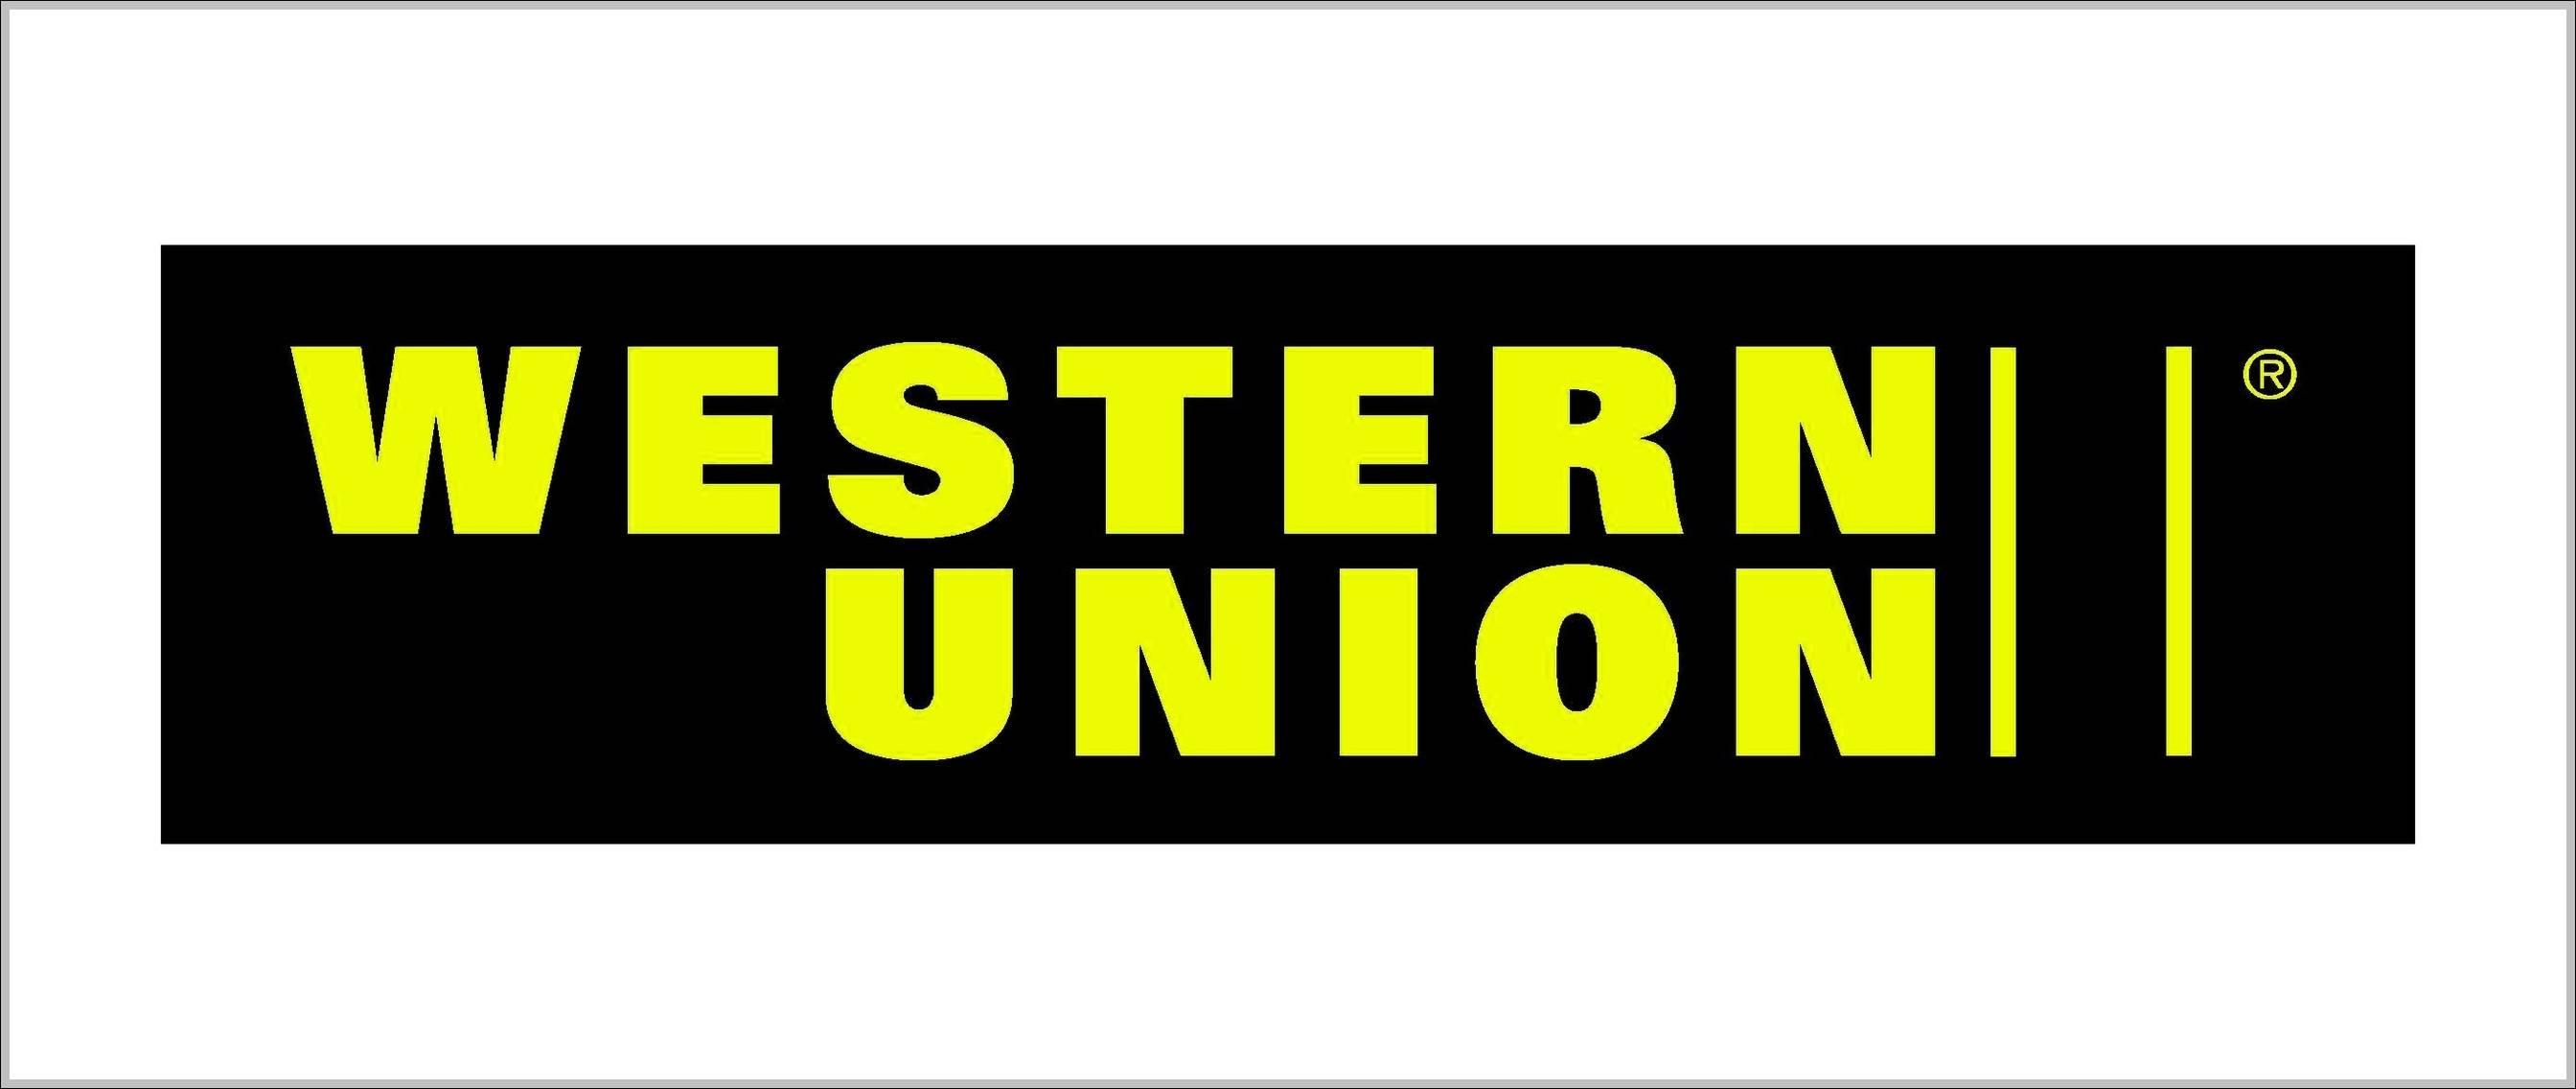 Western Union logo old